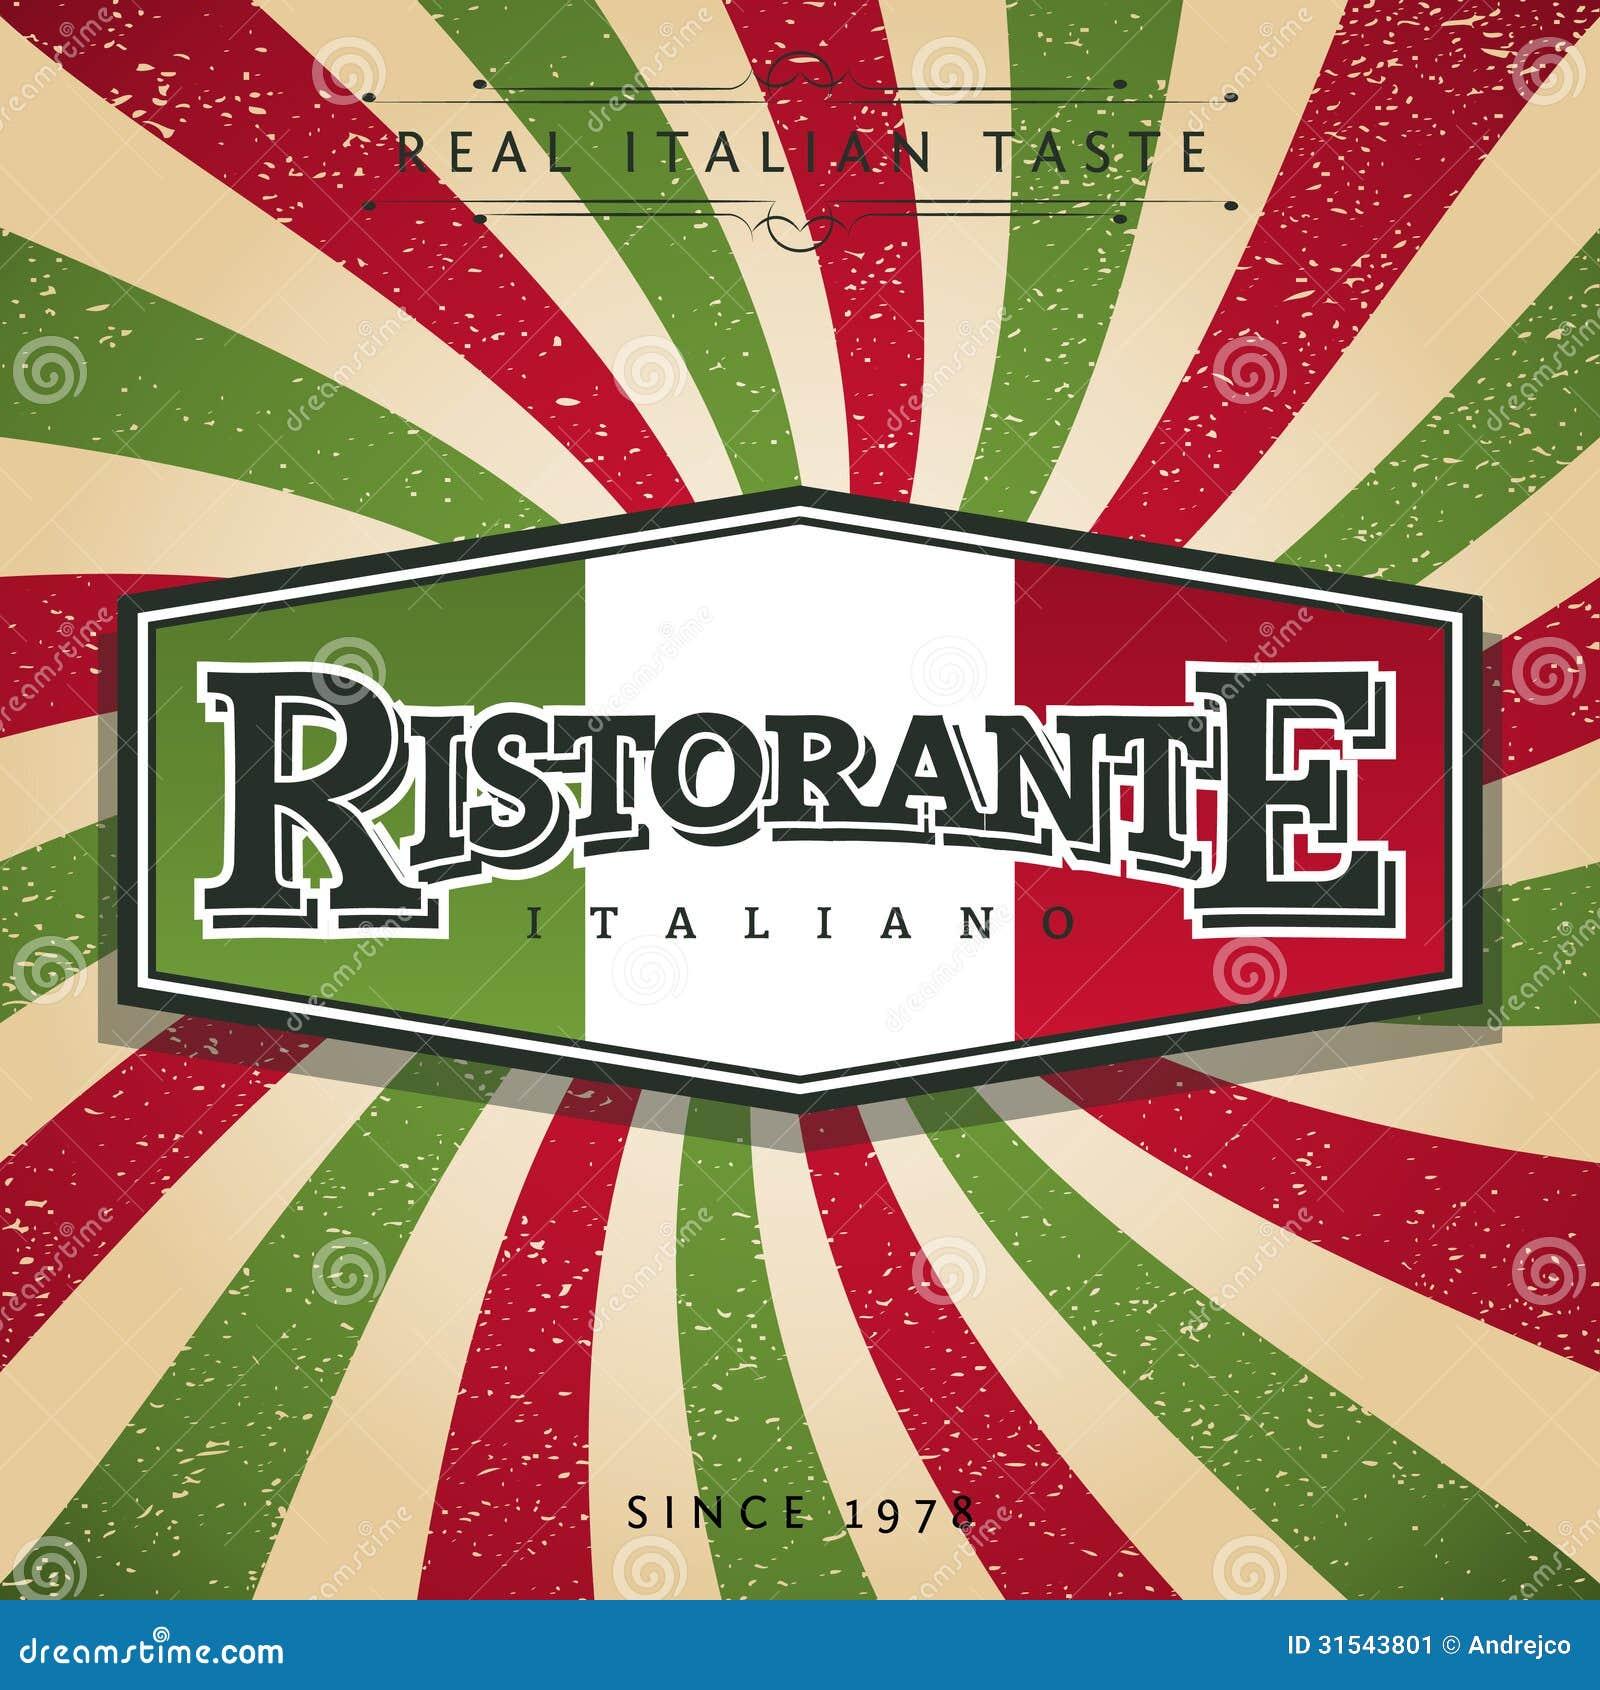 Italian Restaurant Logo With Flag: Italian Restaurant Stock Vector. Image Of Backdrop, Text